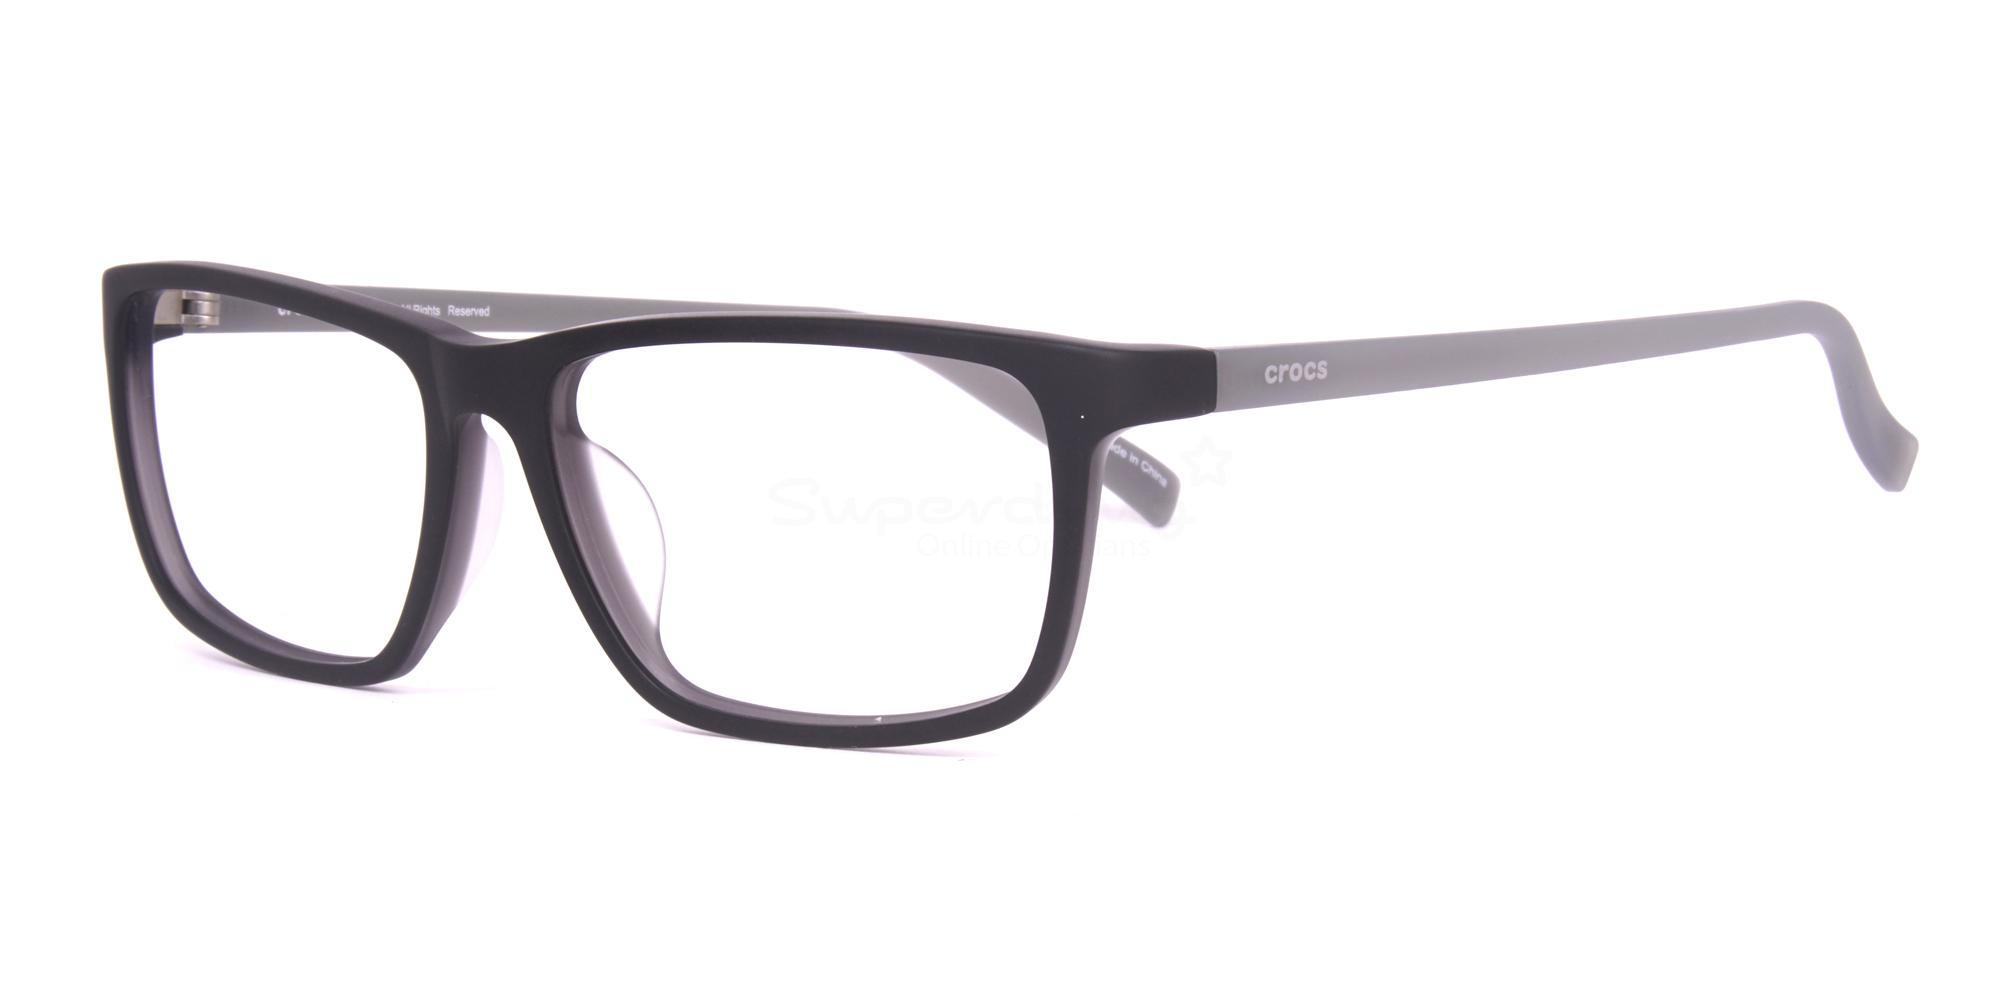 20GY CF4021 Glasses, Crocs Eyewear